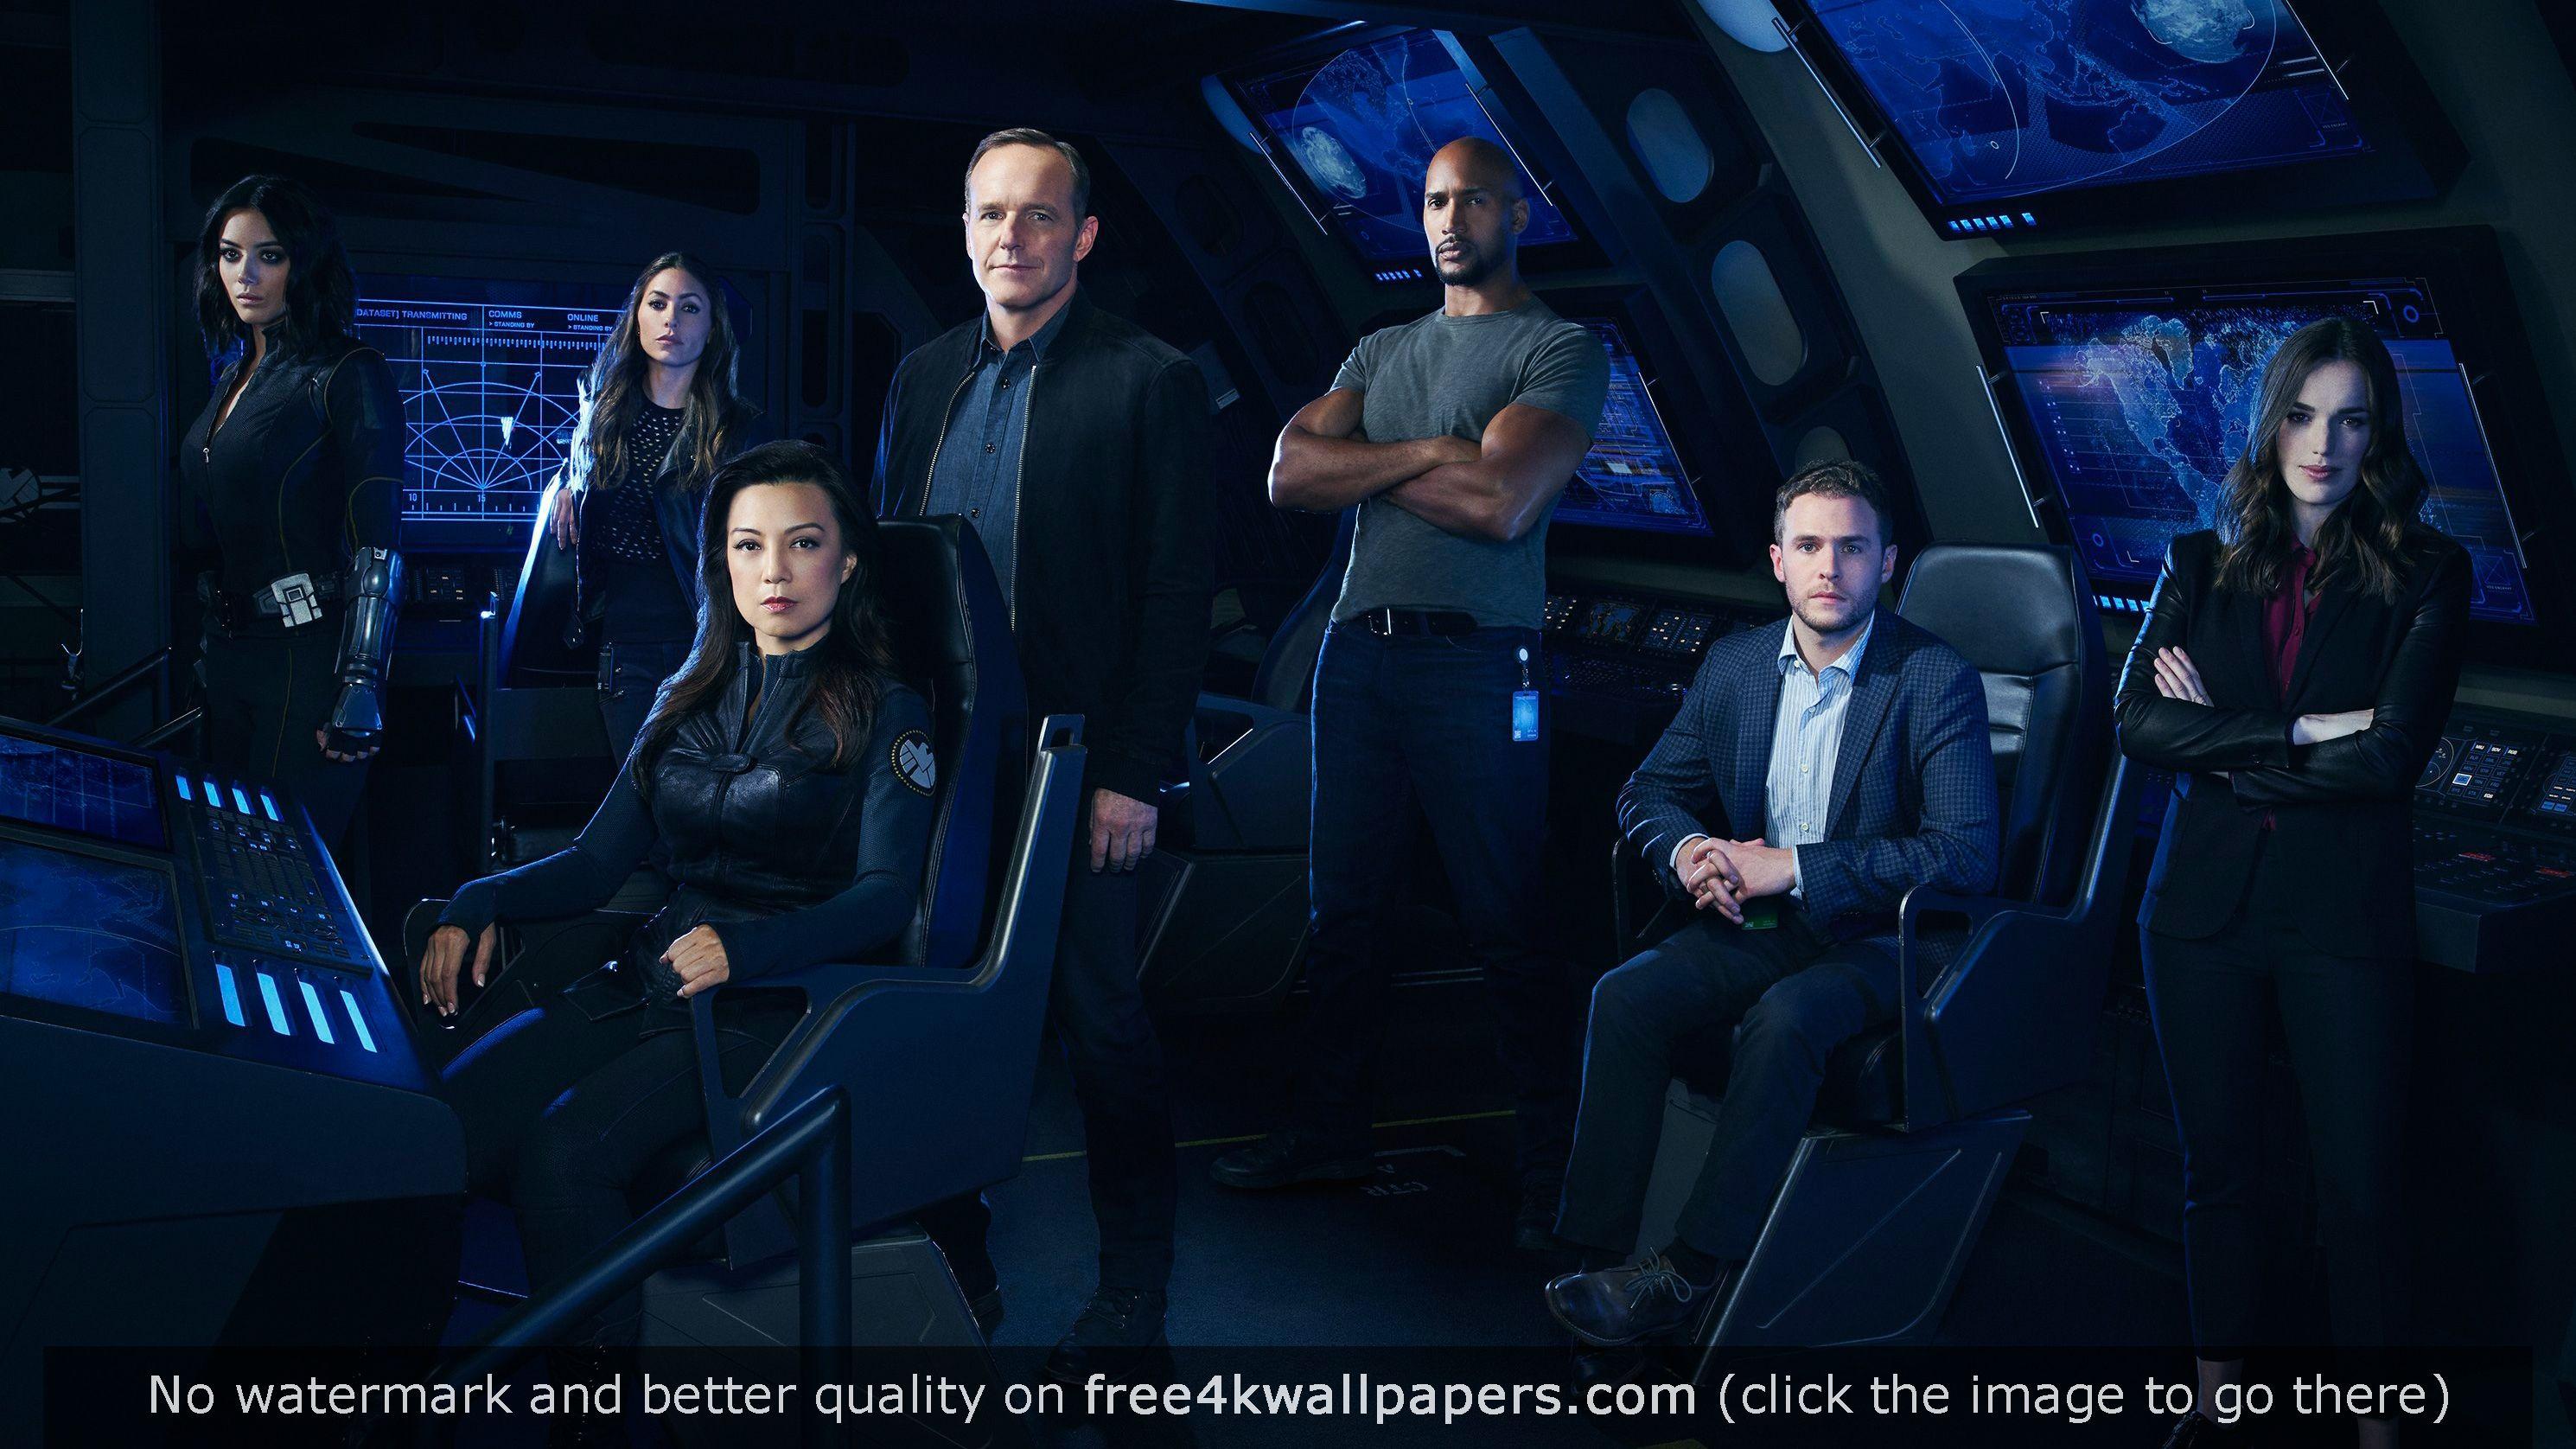 Agents Of Shield Season 4 Hd Wallpaper Agents Of Shield Agents Of Shield Seasons Marvel Agents Of Shield